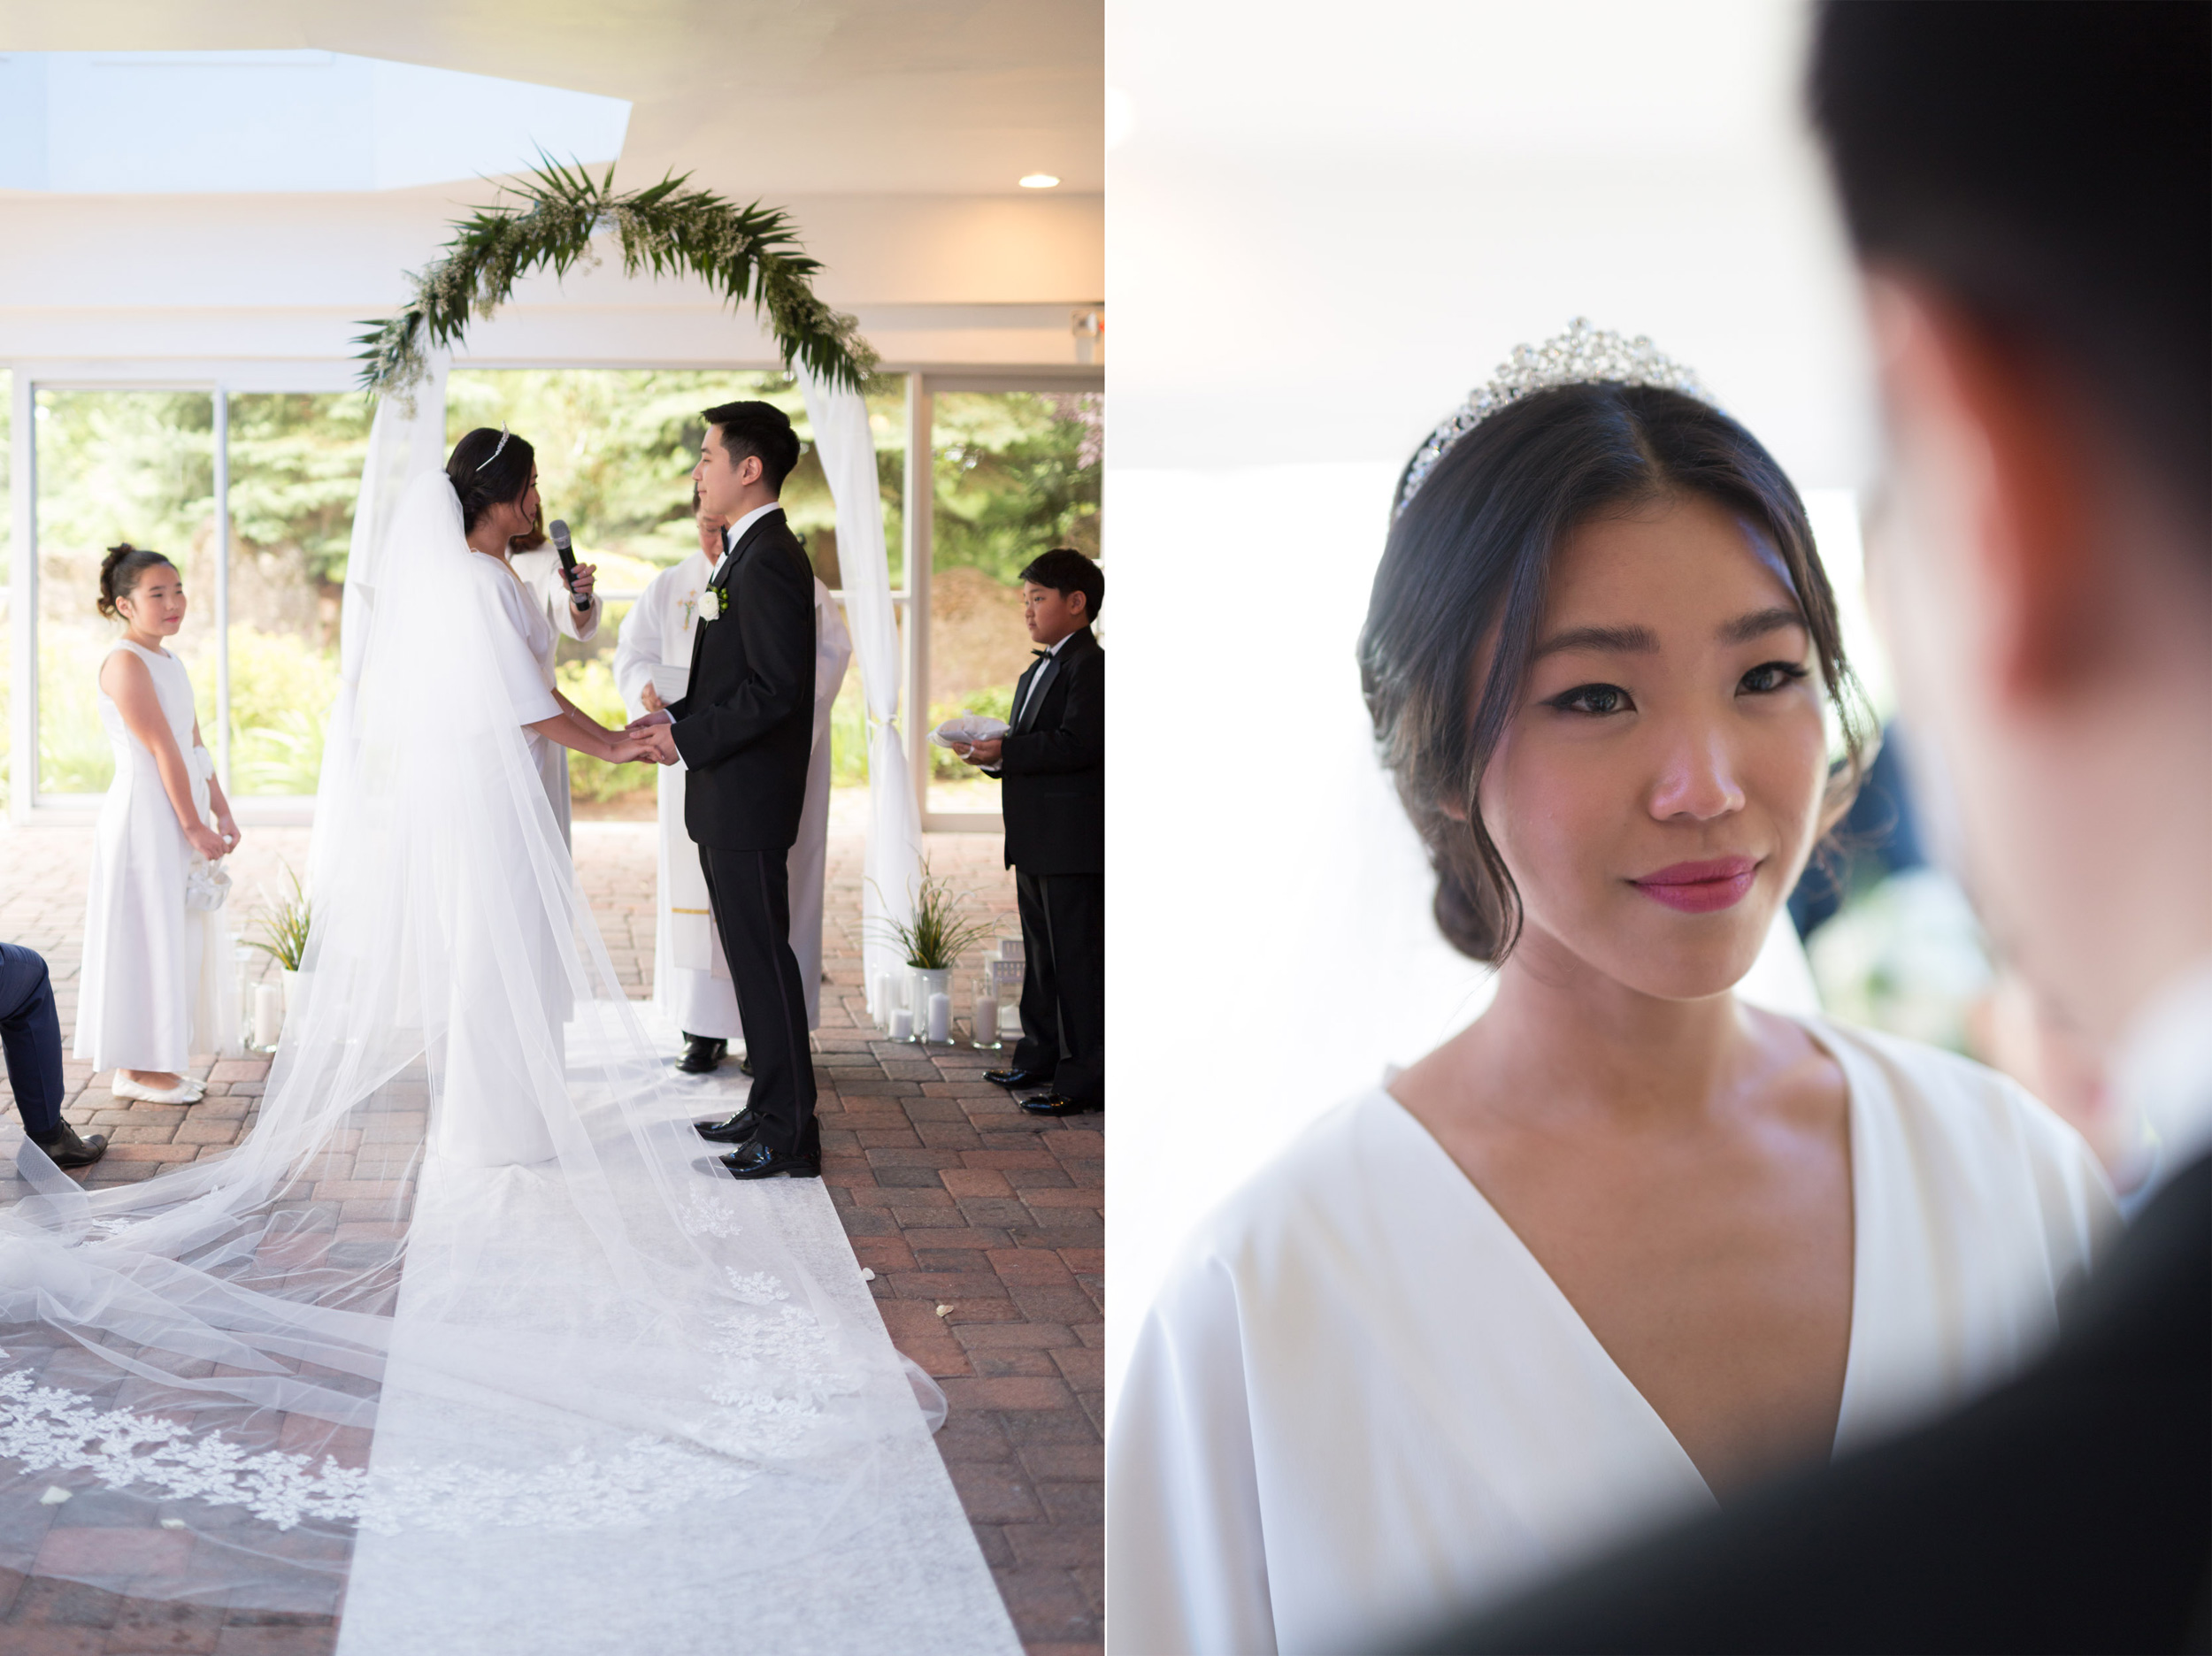 jean-arnold-wedding-0026.jpg